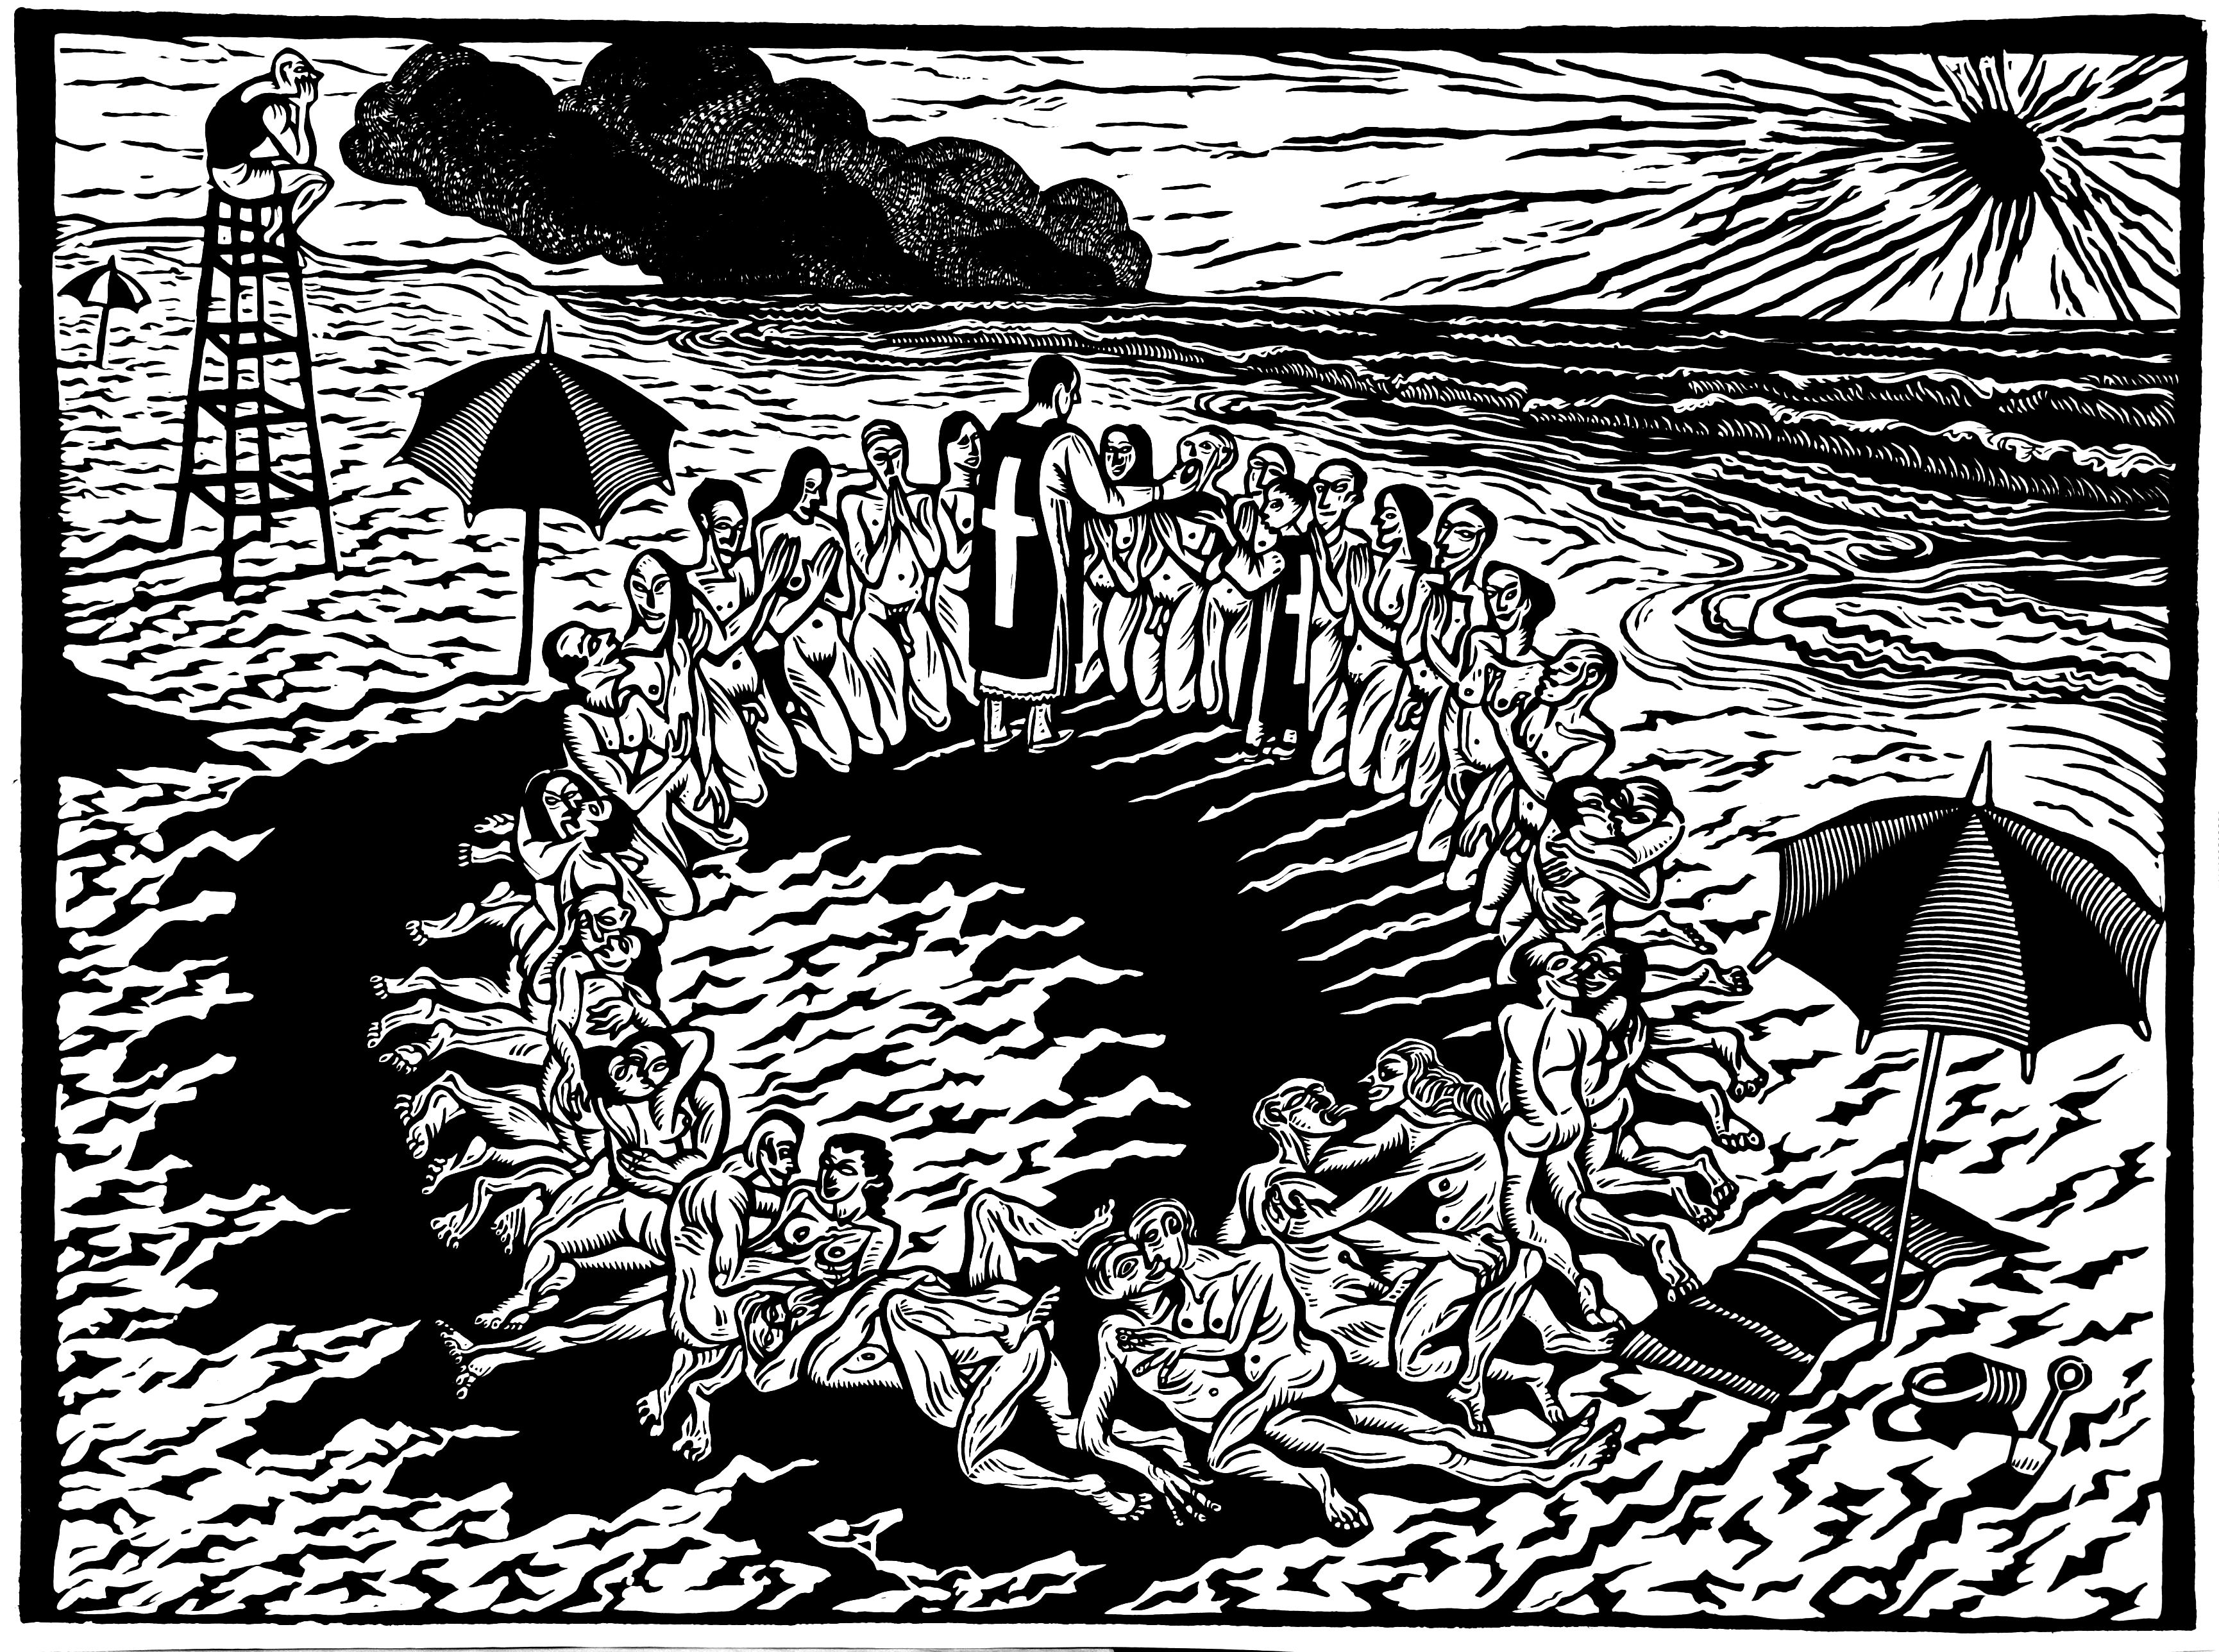 La fiesta controlada en una playa de verano. Alfredo Benavidez Bedoya